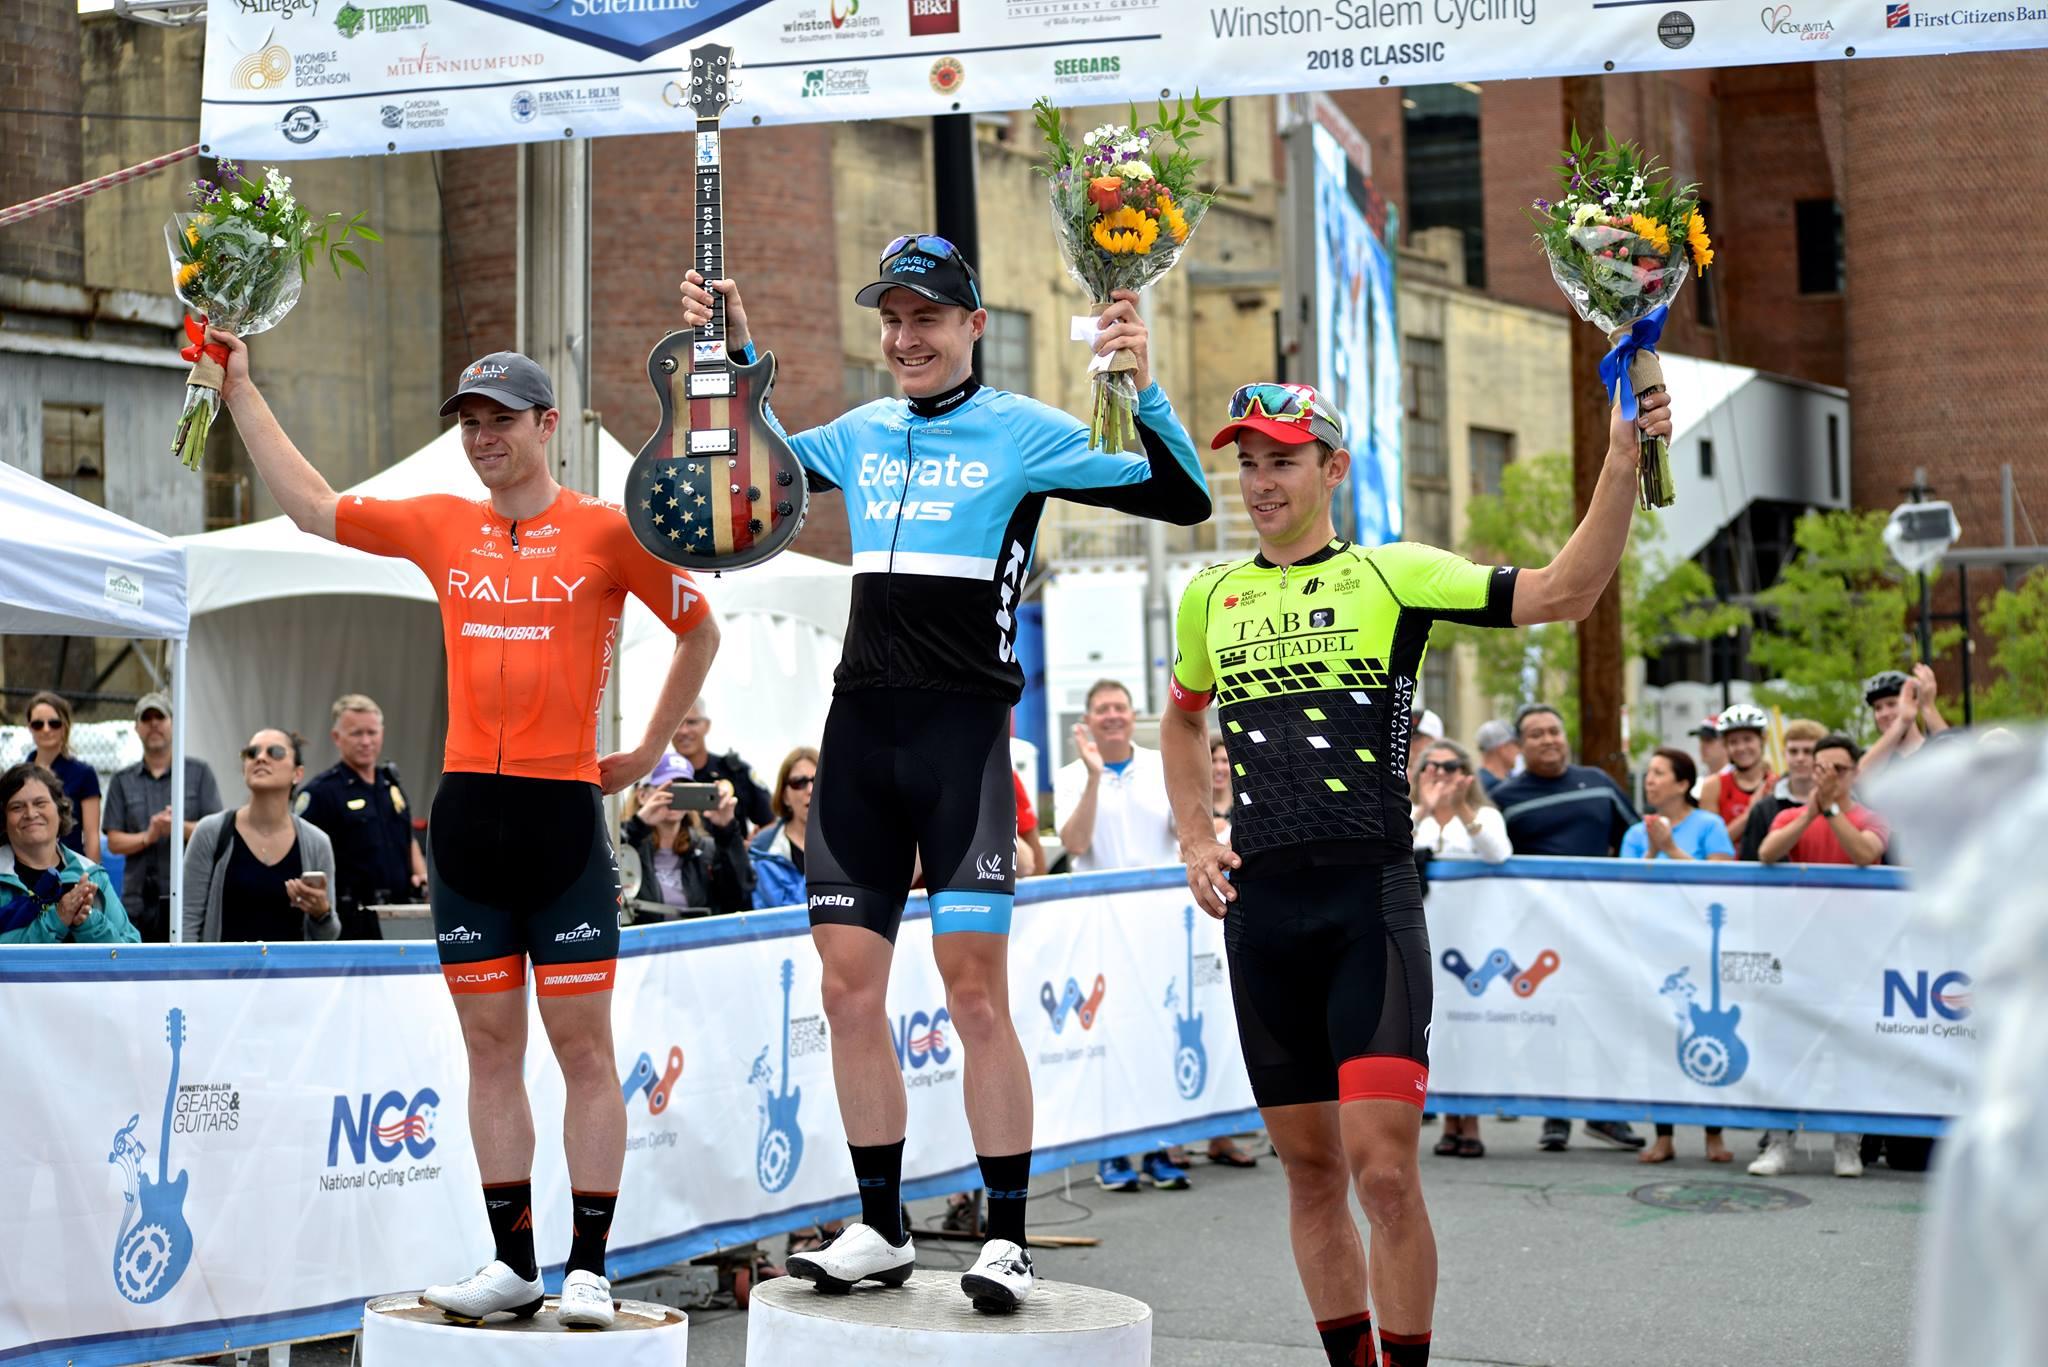 Подиум Winston Salem Cycling Classic — 2018